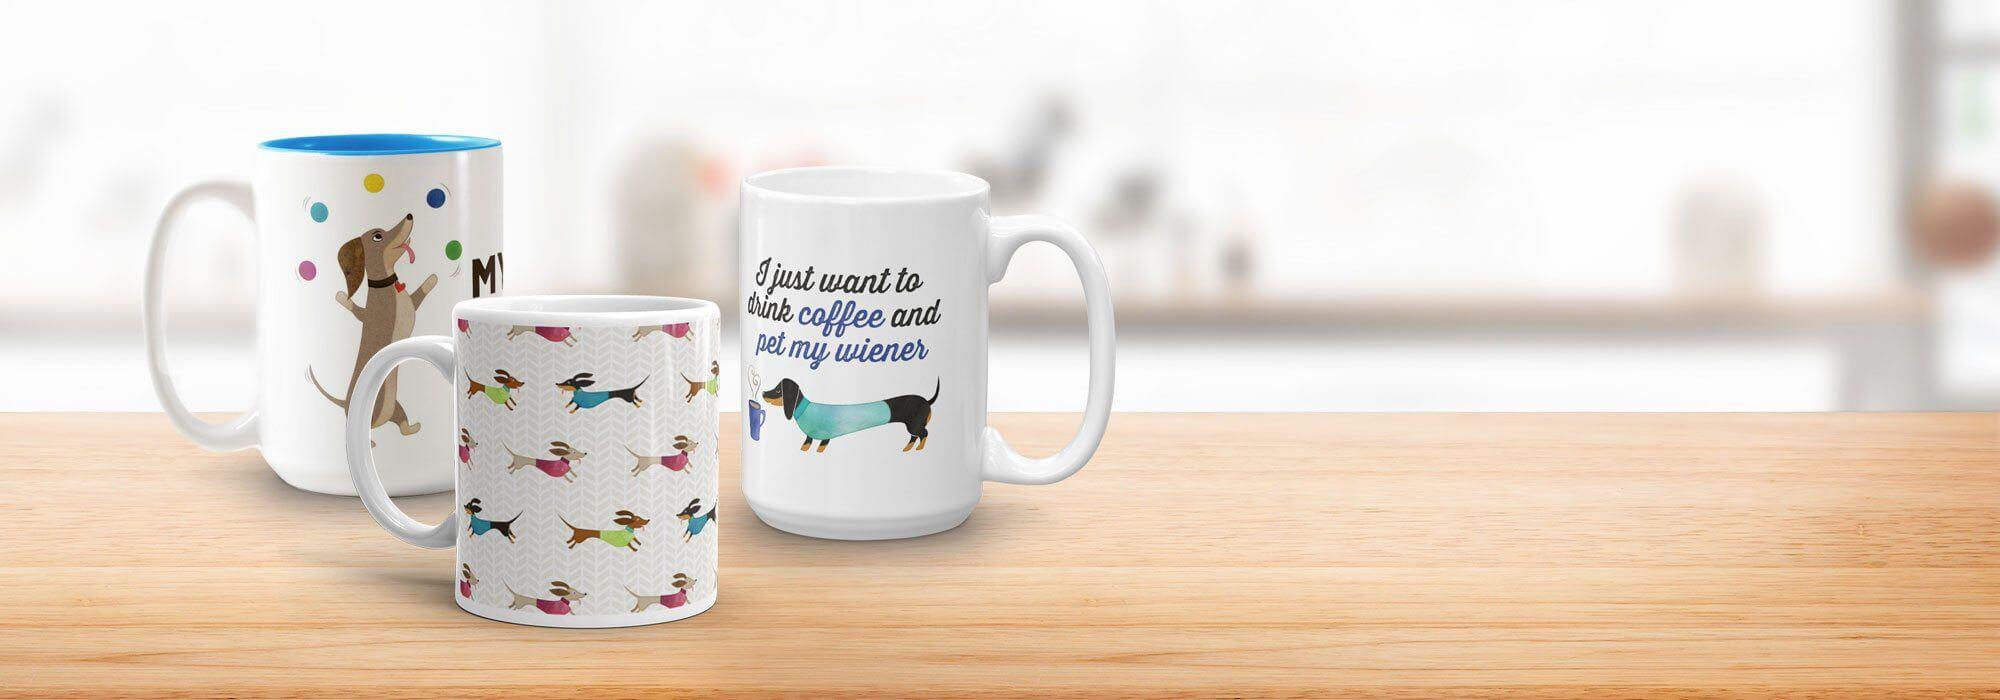 dachshund mugs